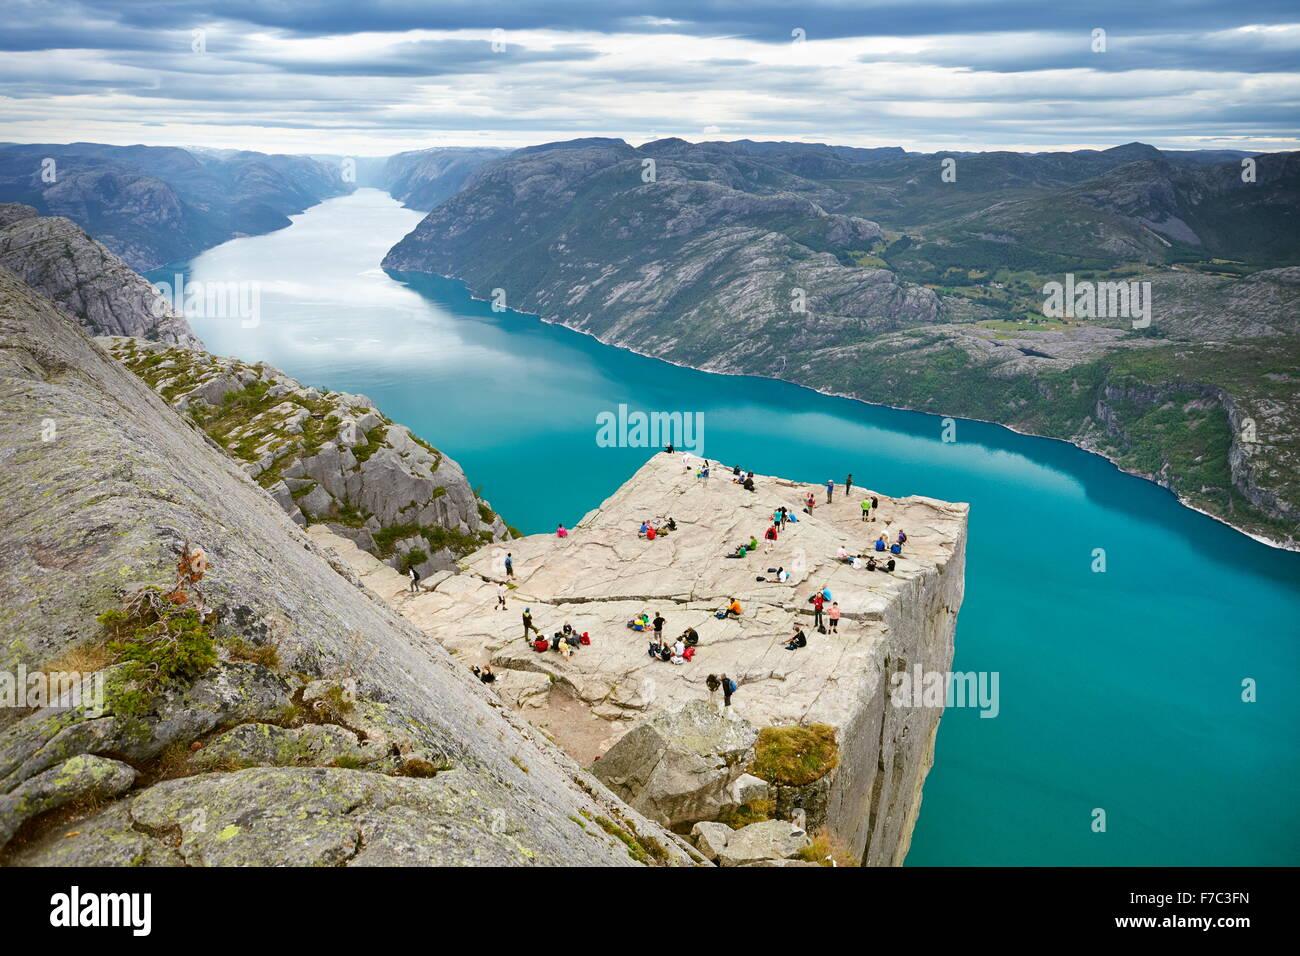 Preikestolen landscape (Pulpit Rock), Lysefjorden, Norway - Stock Image